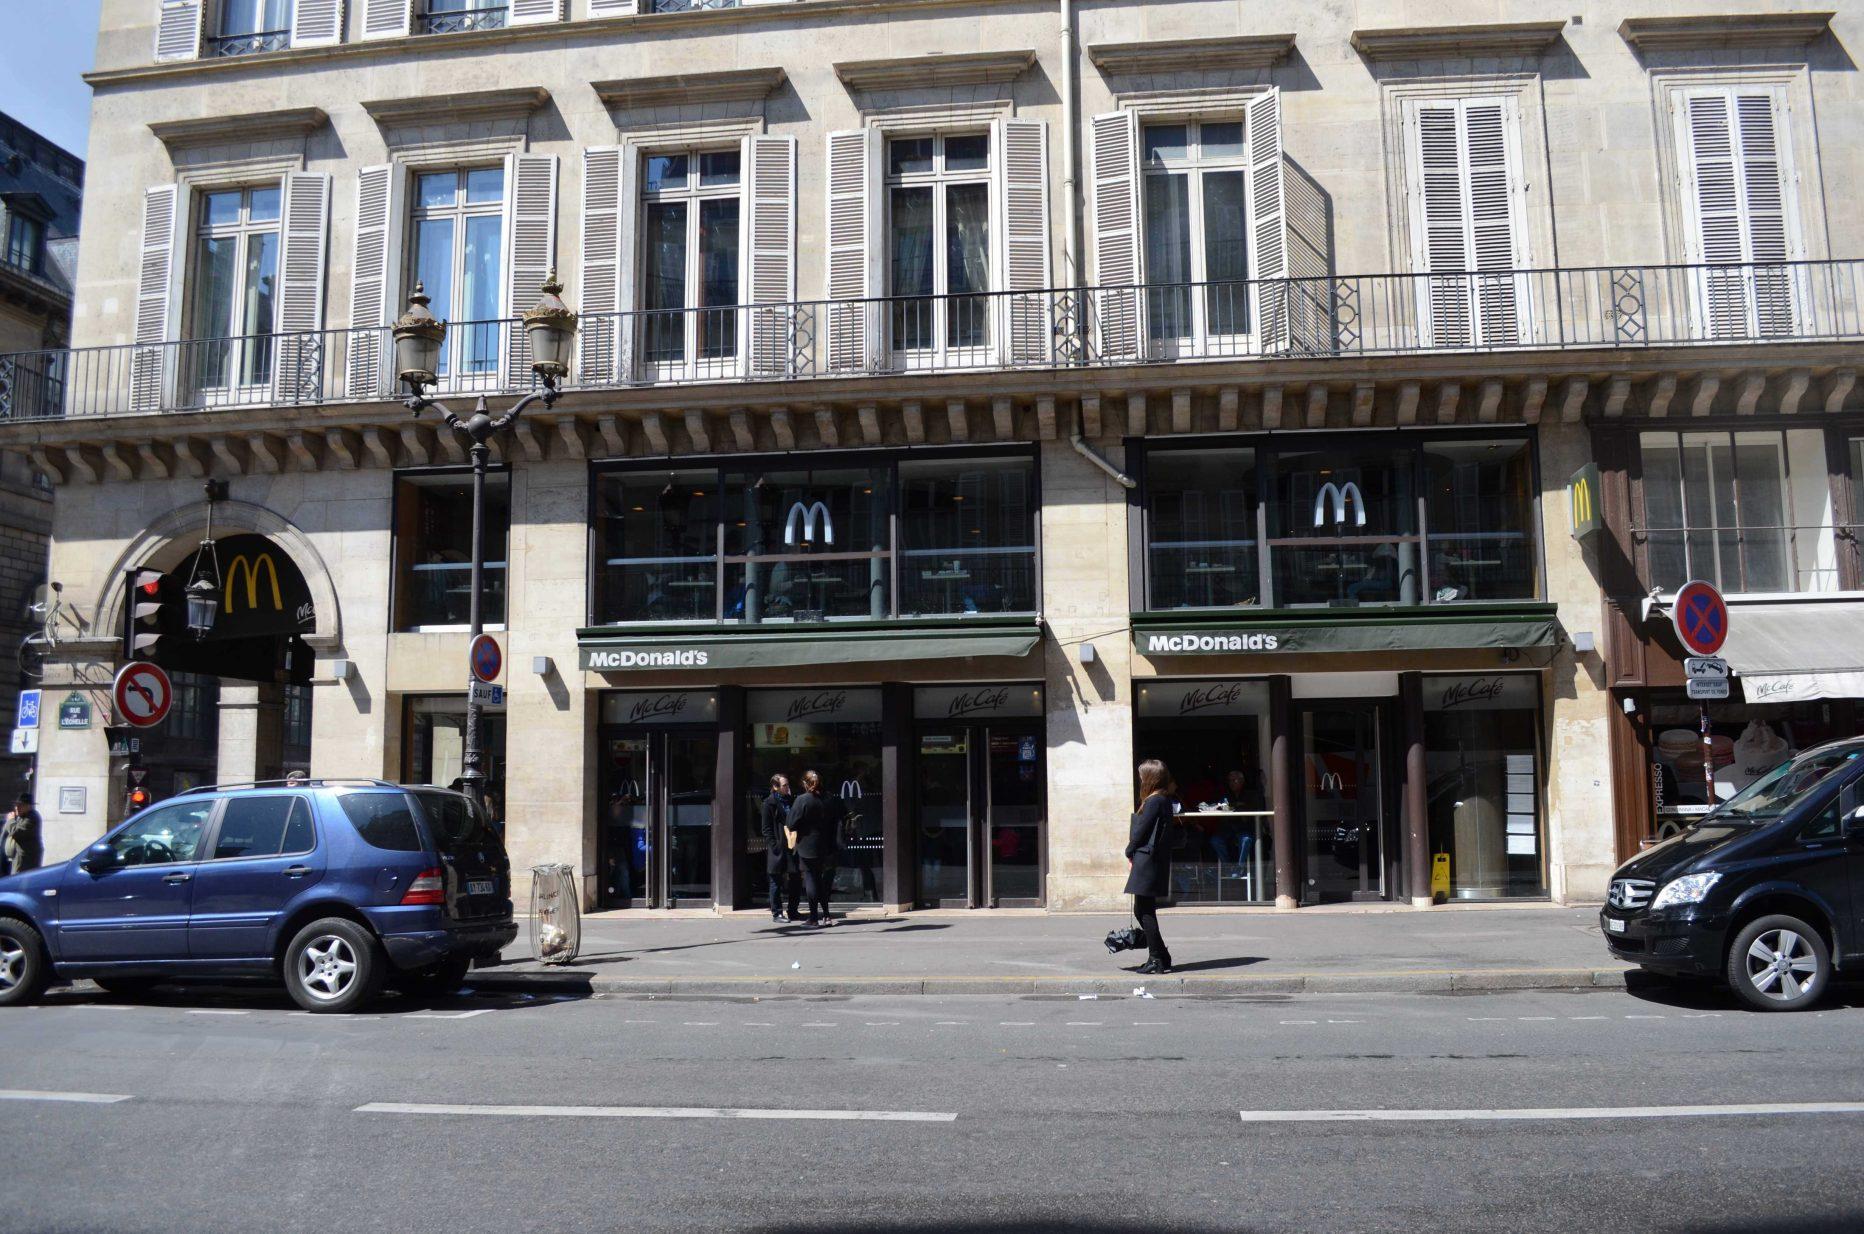 McDonald's Paris louvre rivoli